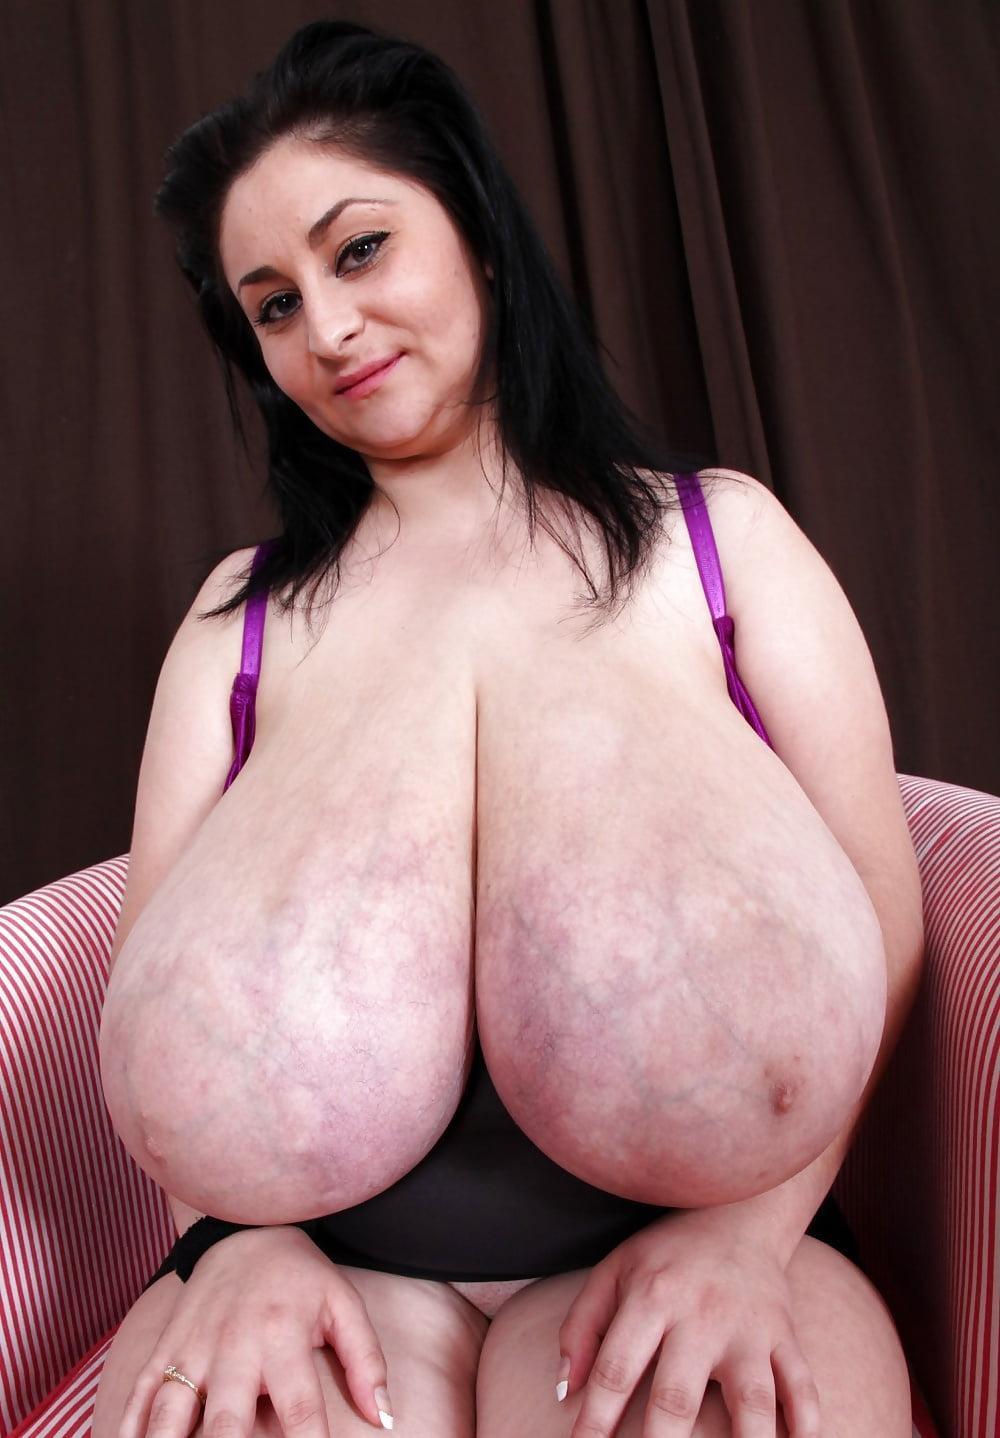 sex-big-humongous-boobs-athlete-naked-panama